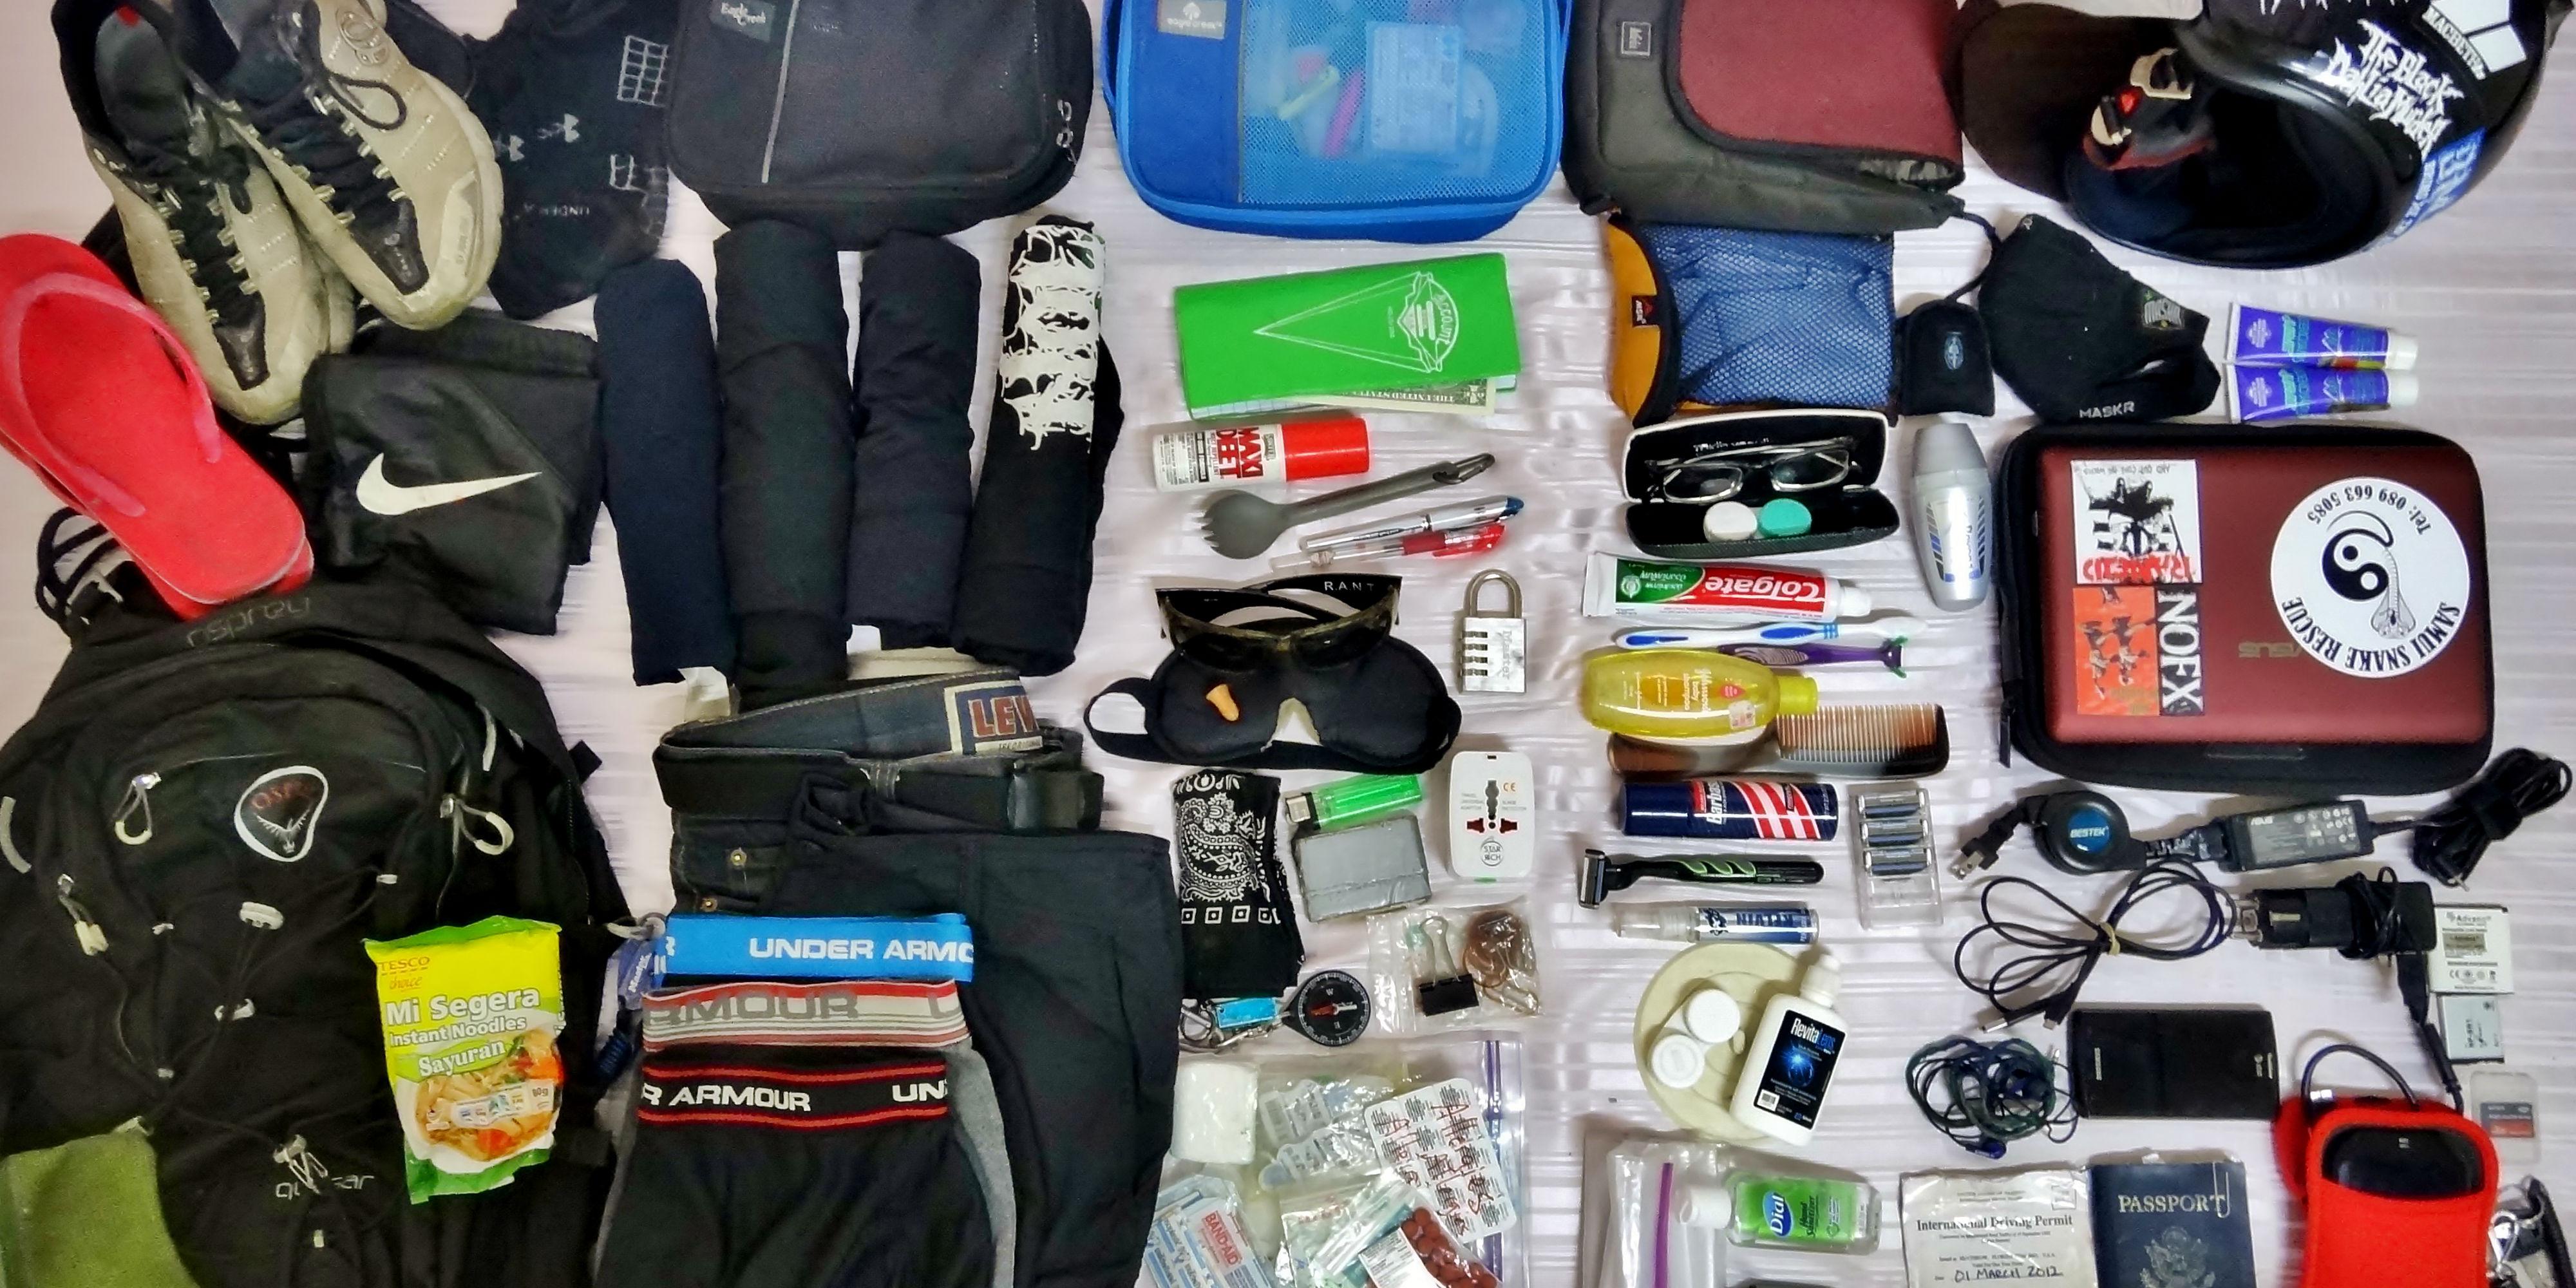 packing list for volunteering